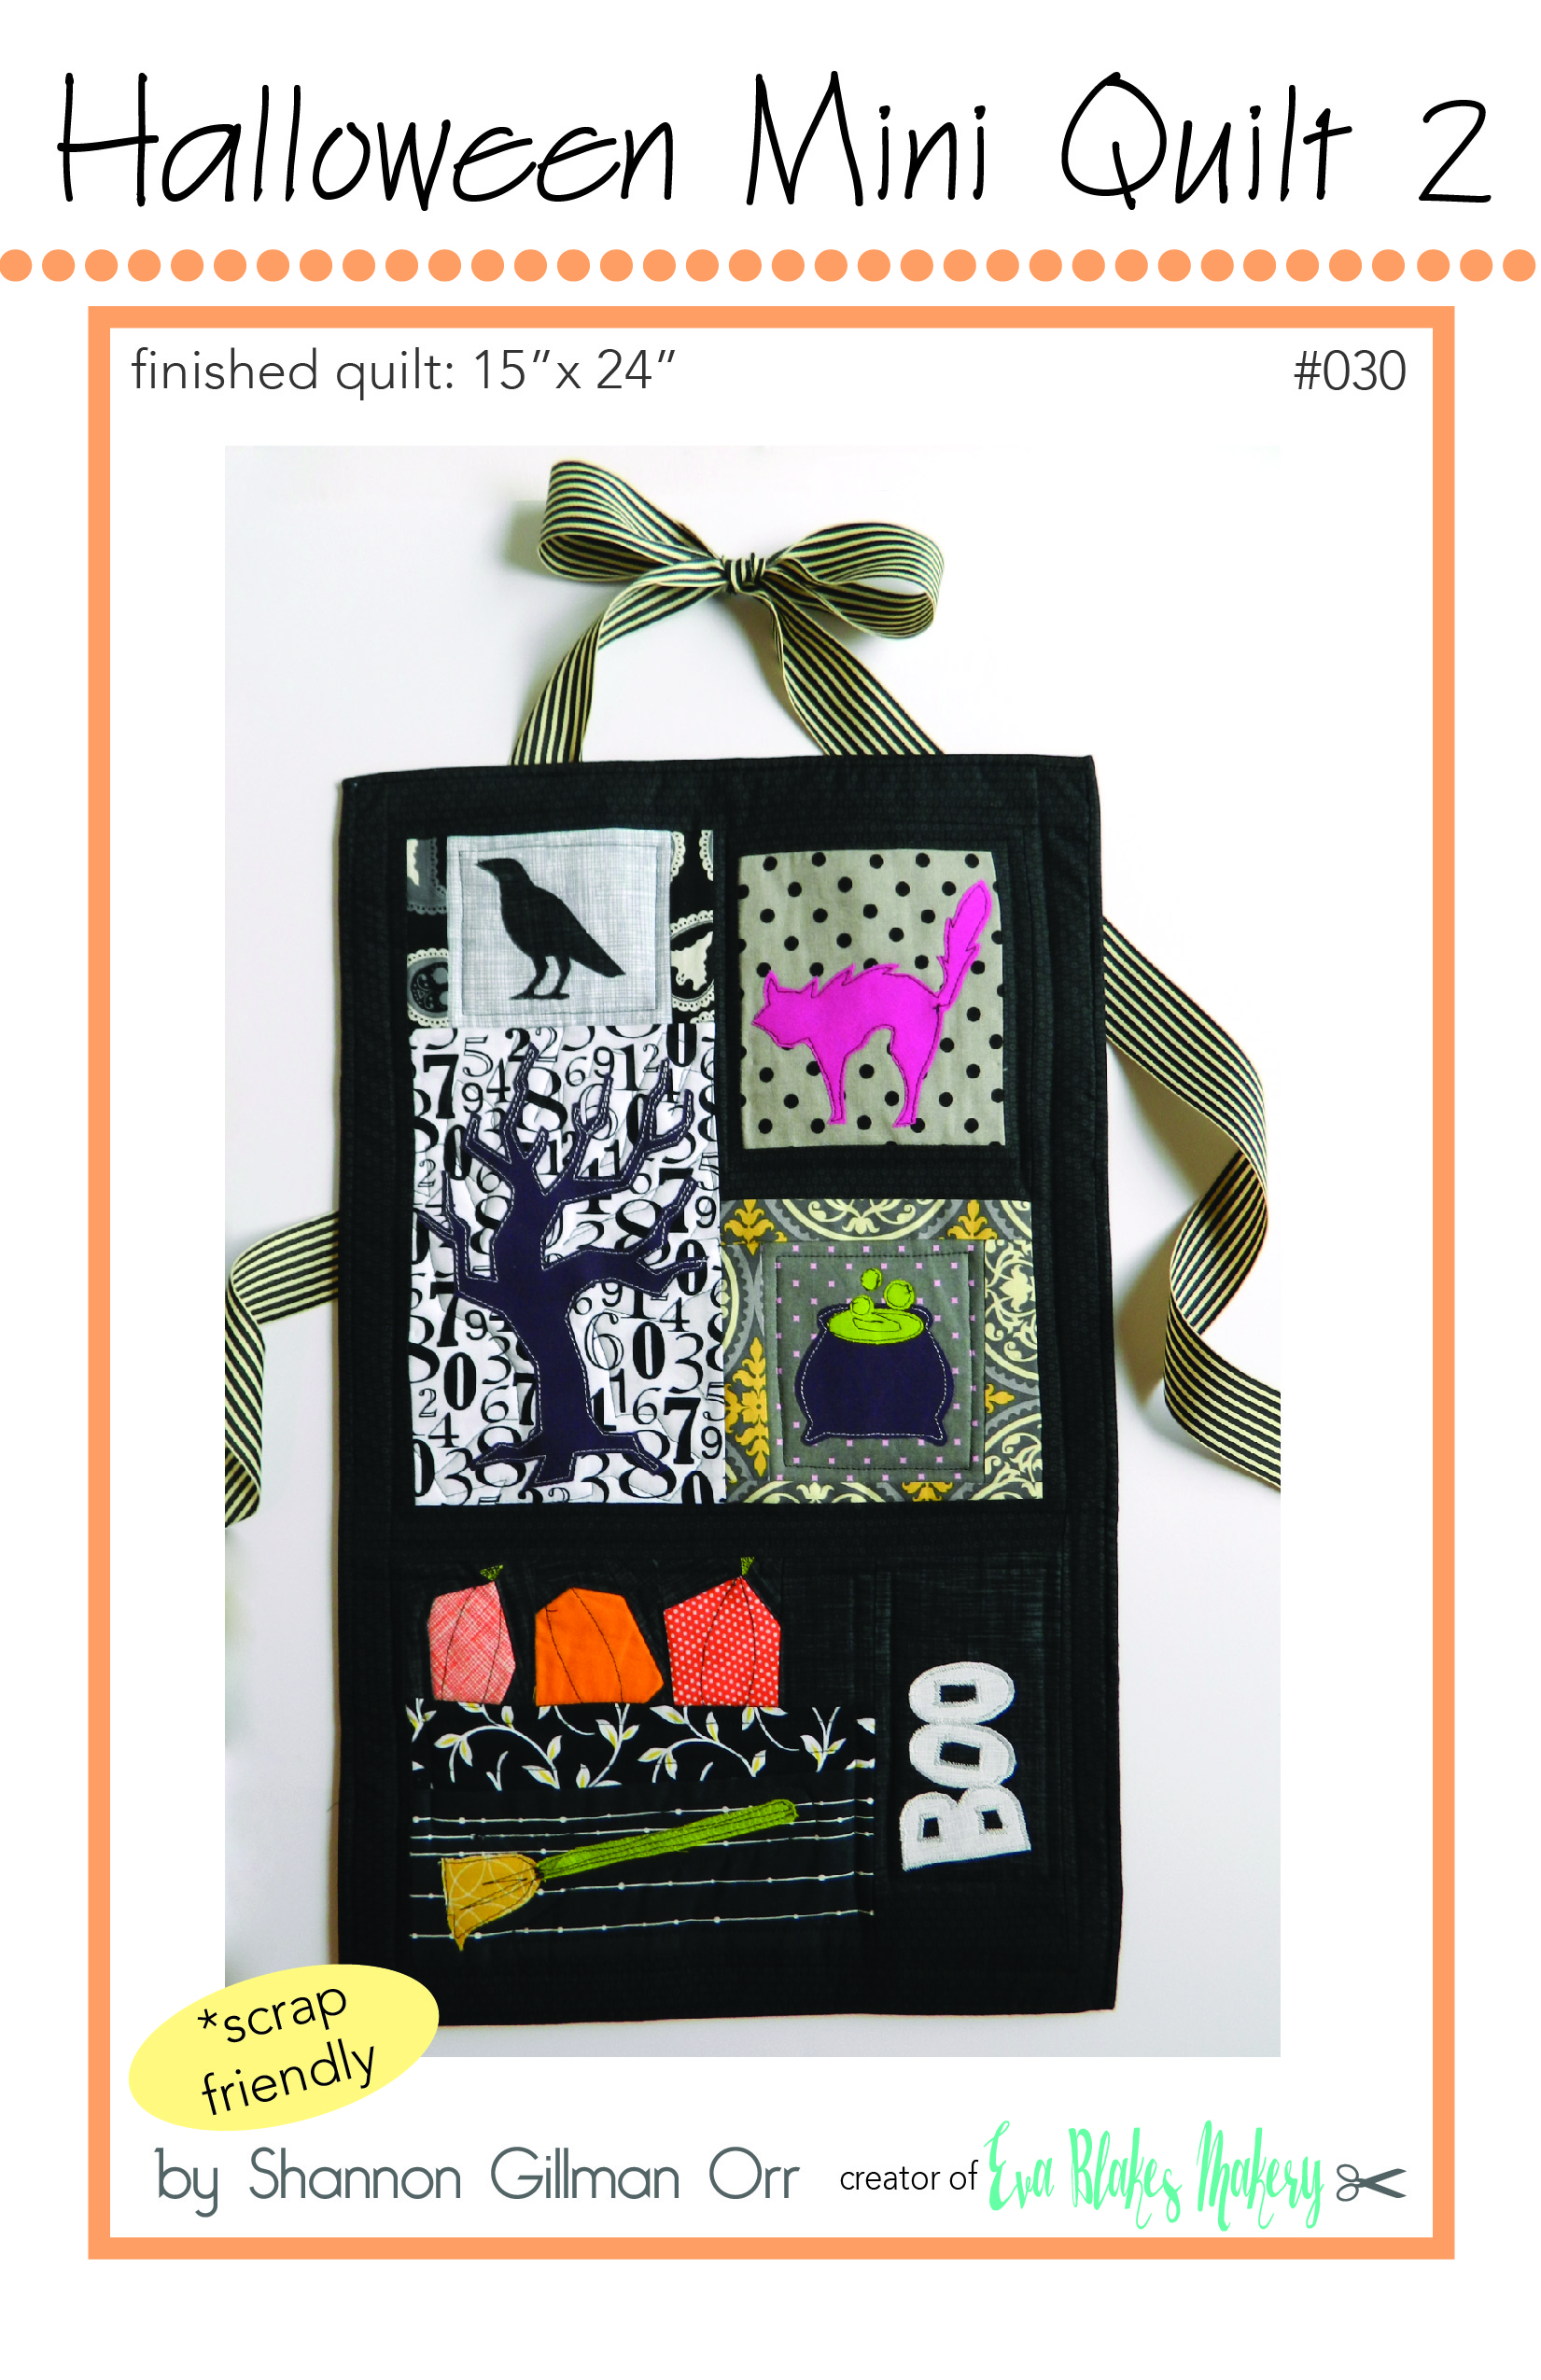 Halloween Mini Quilt 1 Cover_Artboard 1.jpg